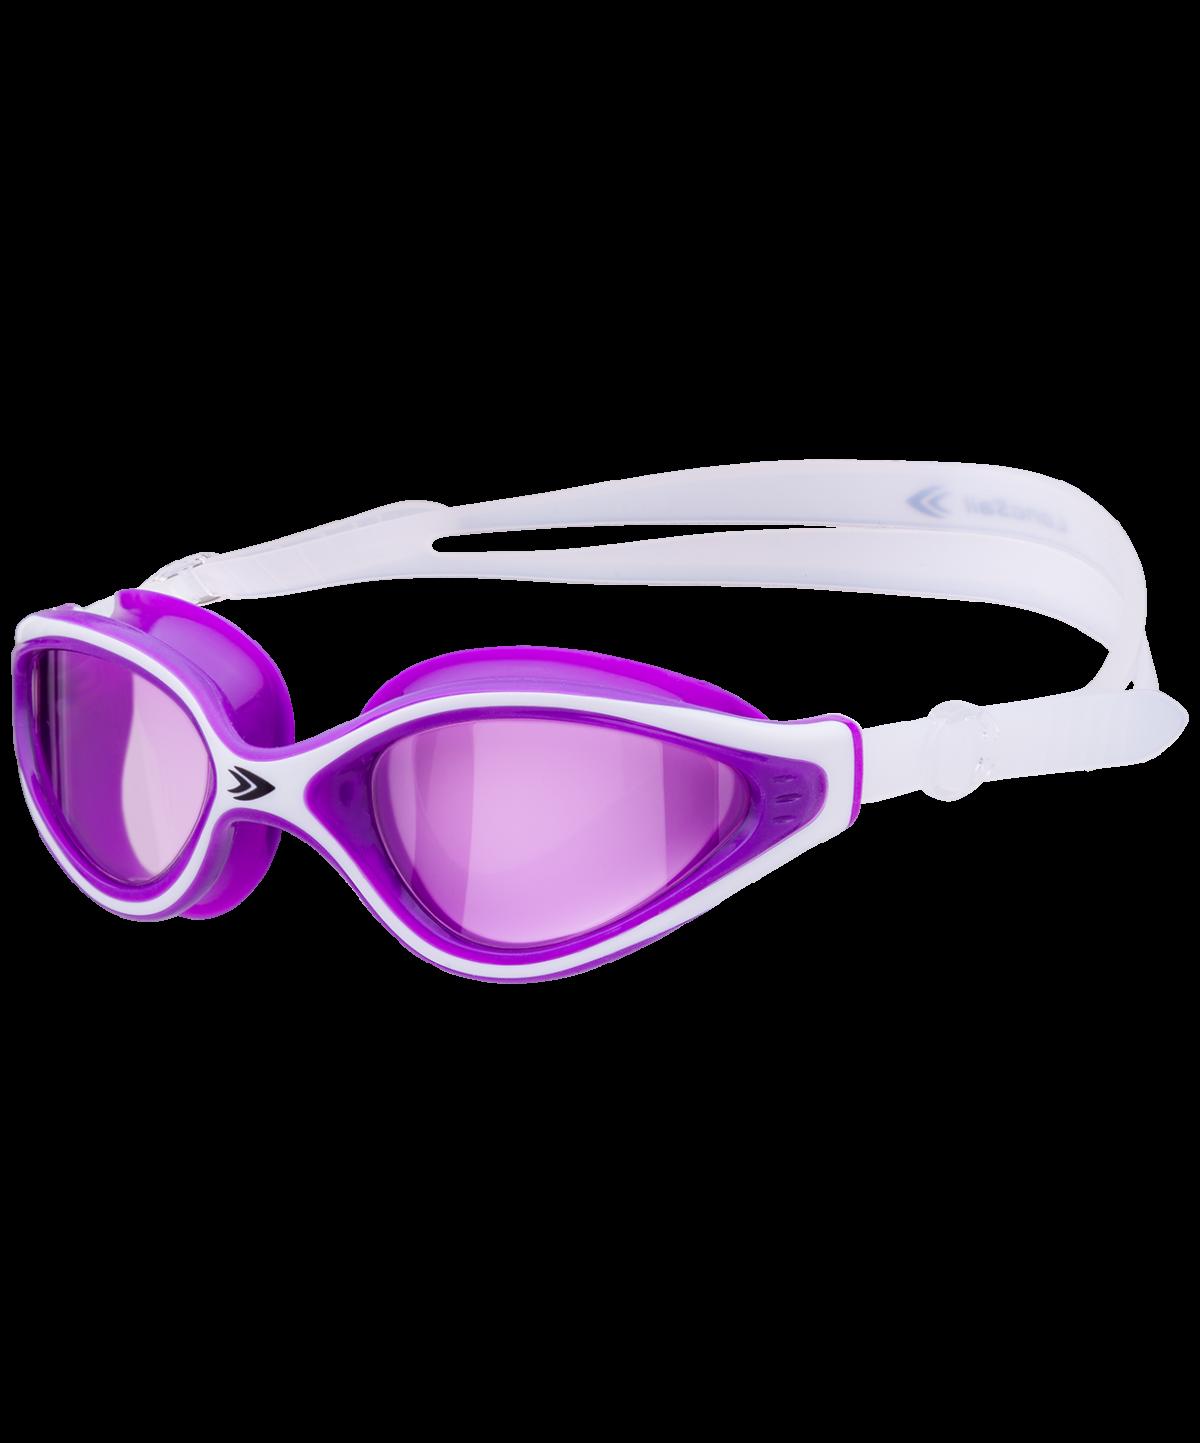 LONGSAIL Serena Очки для плавания  L011002: белый/фиолетовый - 1